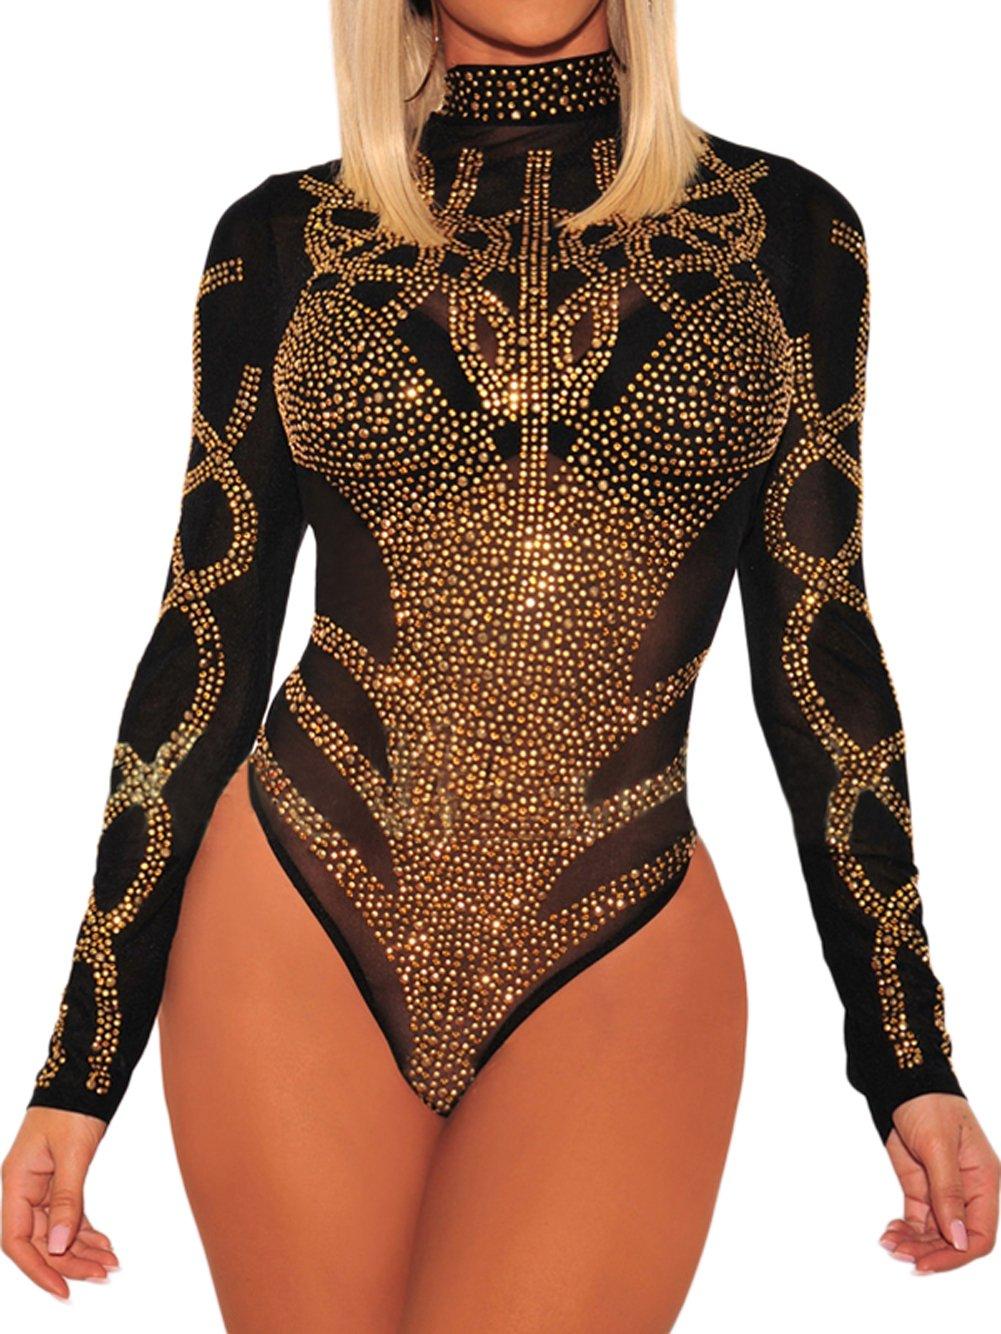 Shawhuwa Women's Mock Neck Long Sleeve Stretchy Jumpsuit Bodysuit Tops Black Gold L